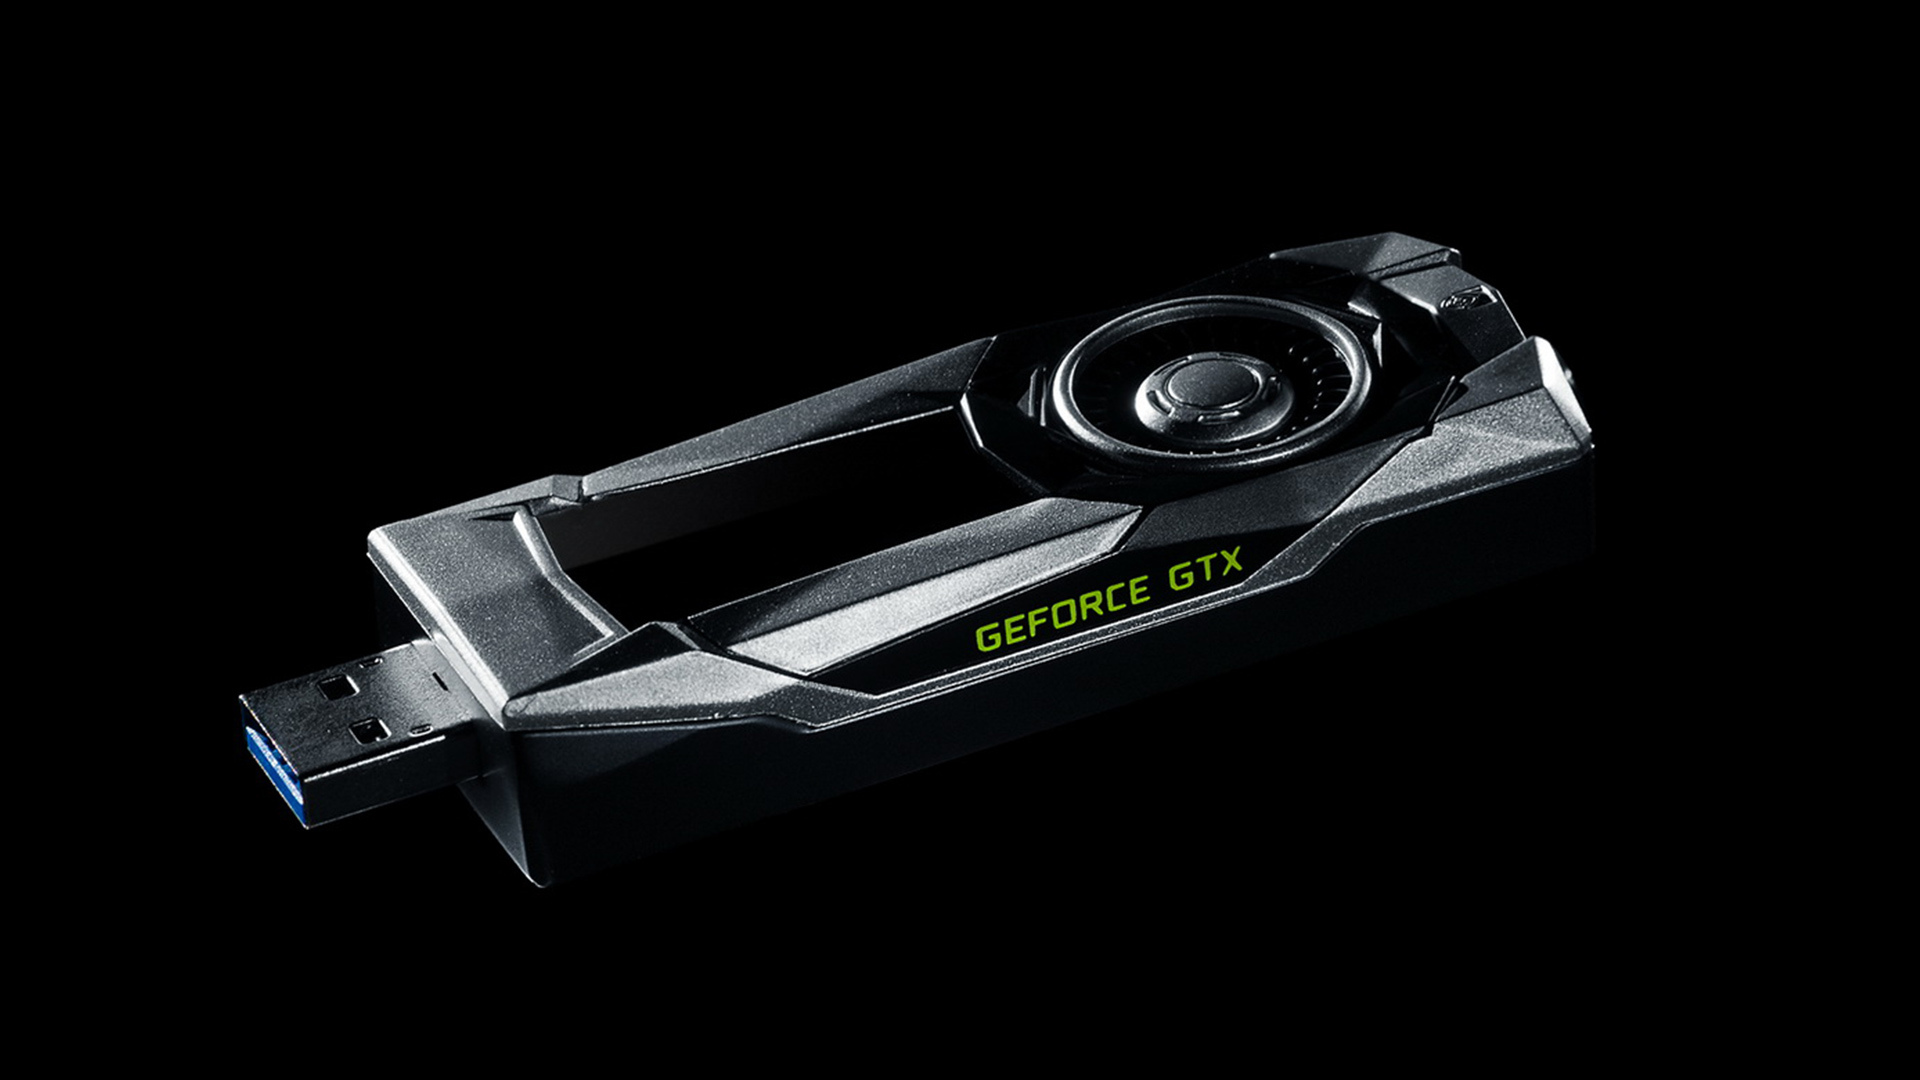 GeForce GTX USB